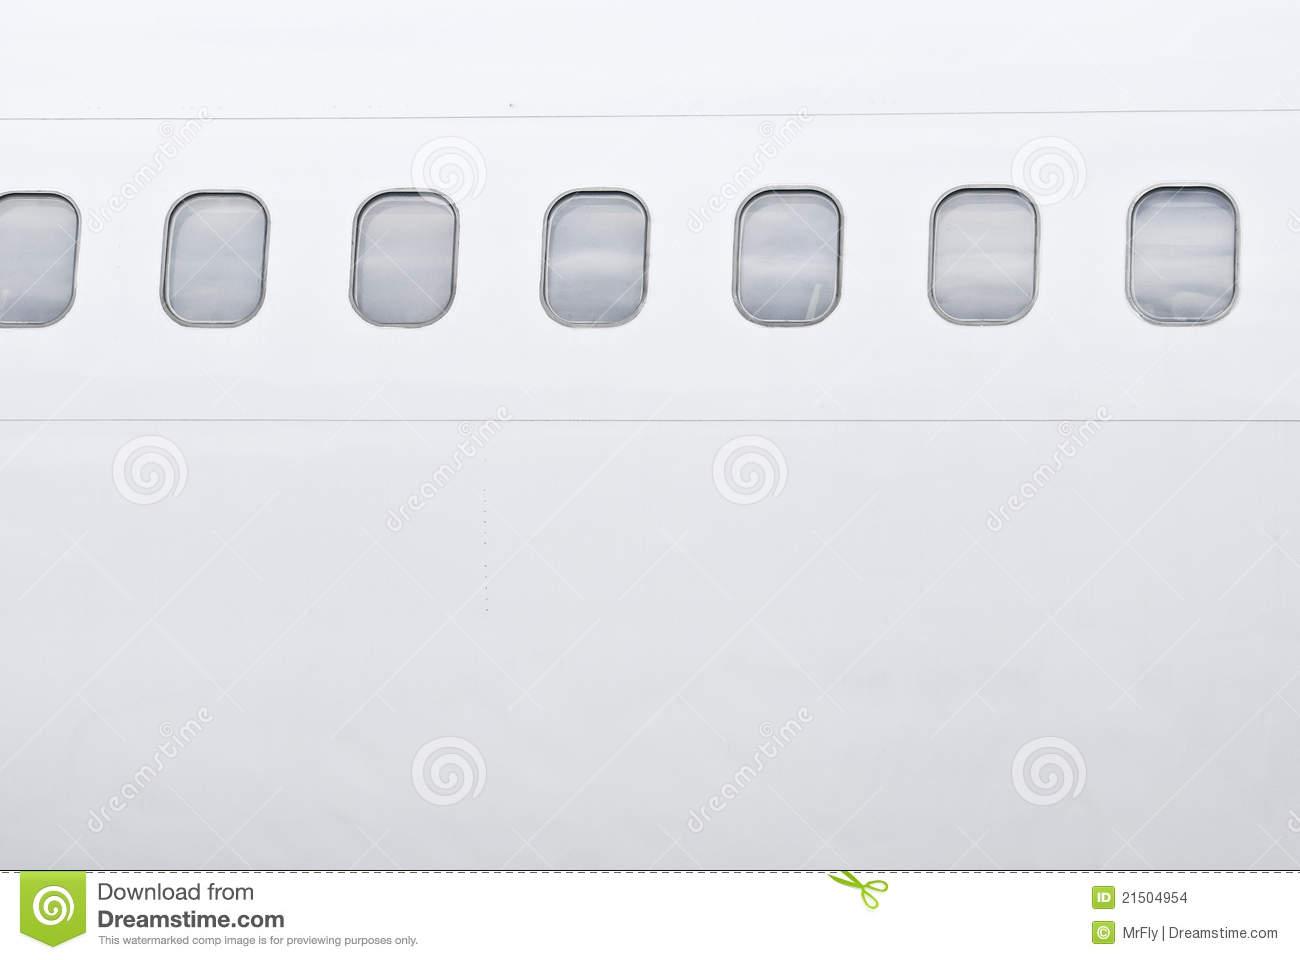 Clipart size windows 10 clip art black and white stock Increase clipart size windows 10 - ClipartFest clip art black and white stock